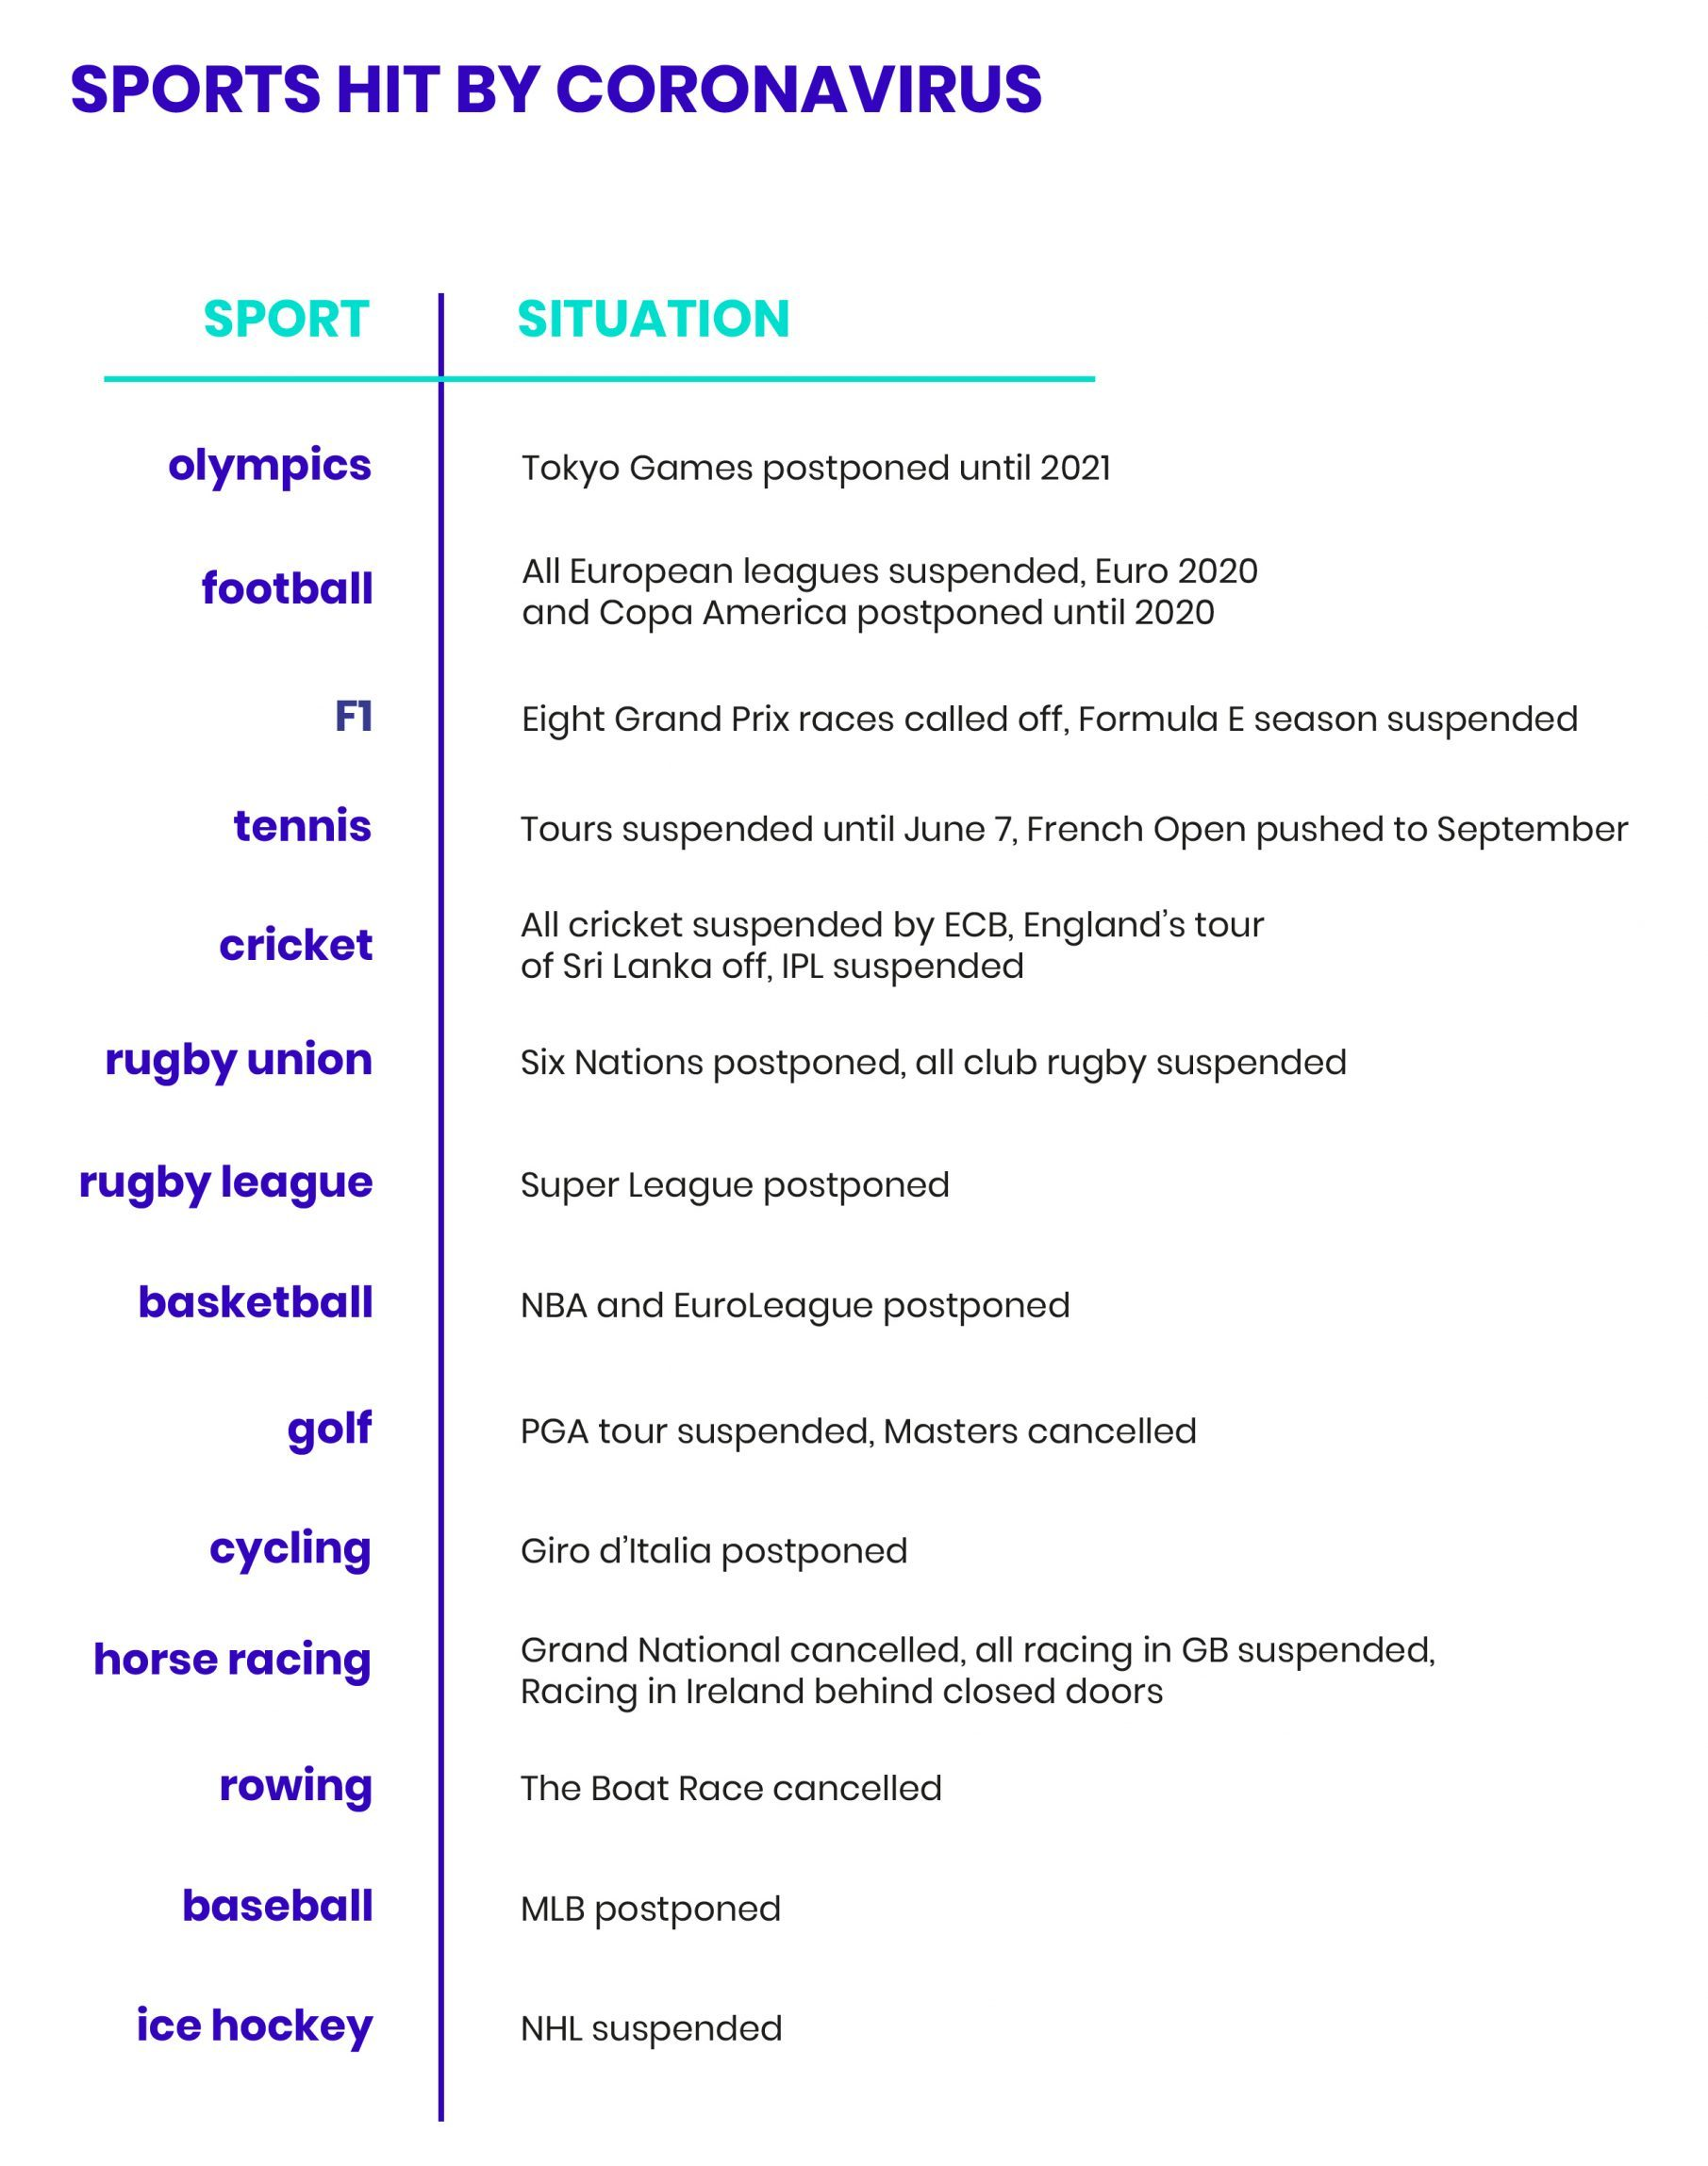 Impact of Corona on sports events